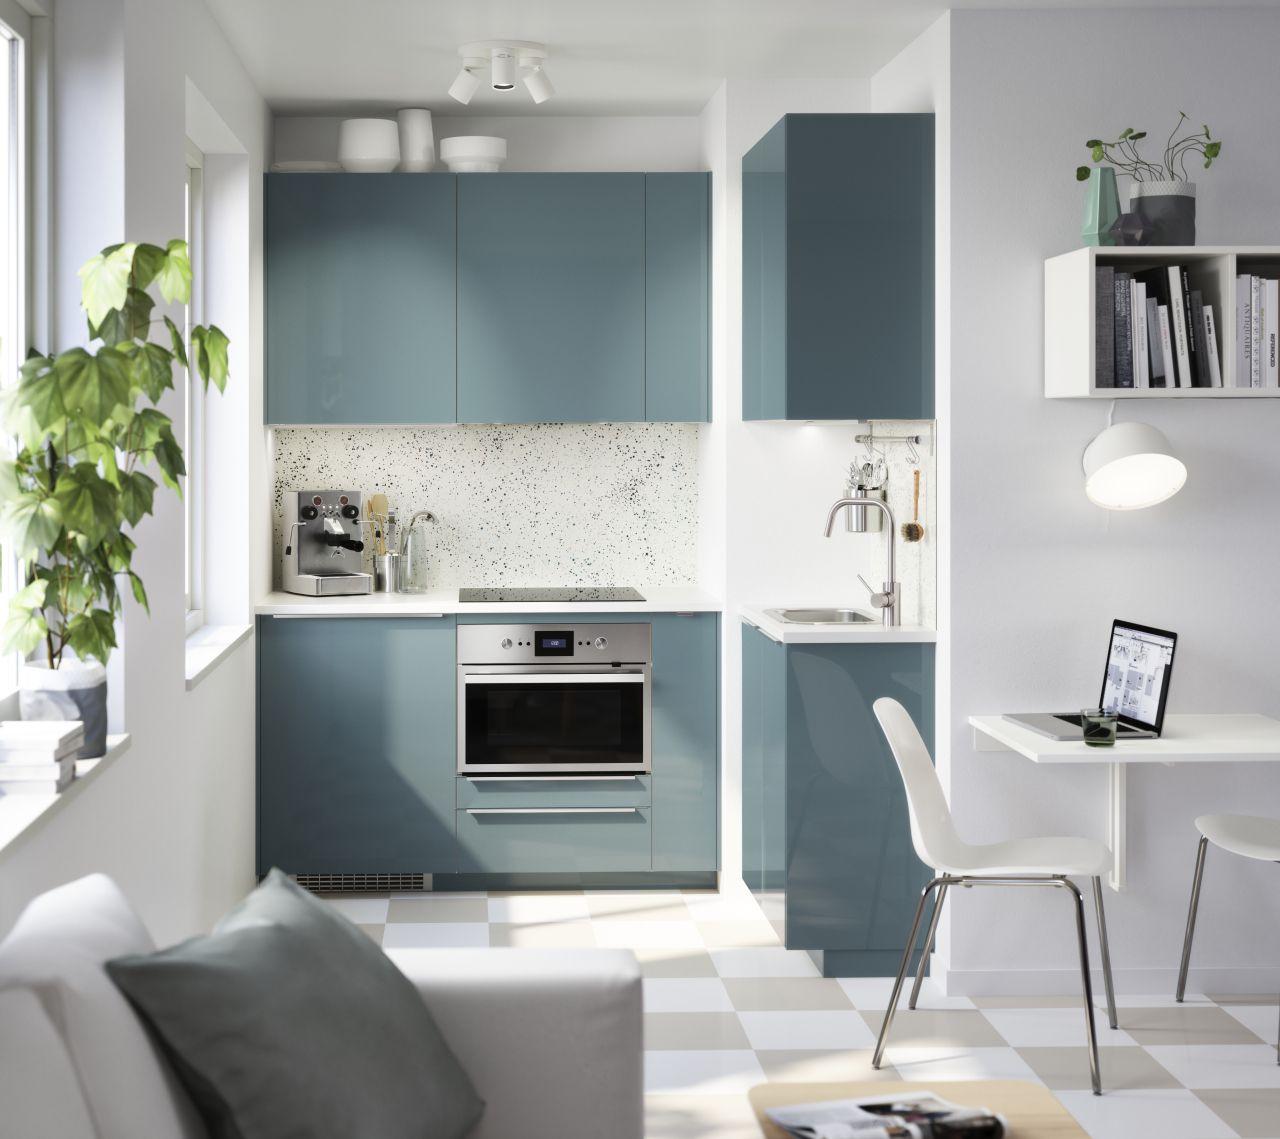 Pin By Ikea Baltics On Kitchen Ideas Open Plan Kitchen Living Room Kitchen Design Duck Egg Blue Living Room #open #living #room #and #kitchen #ideas